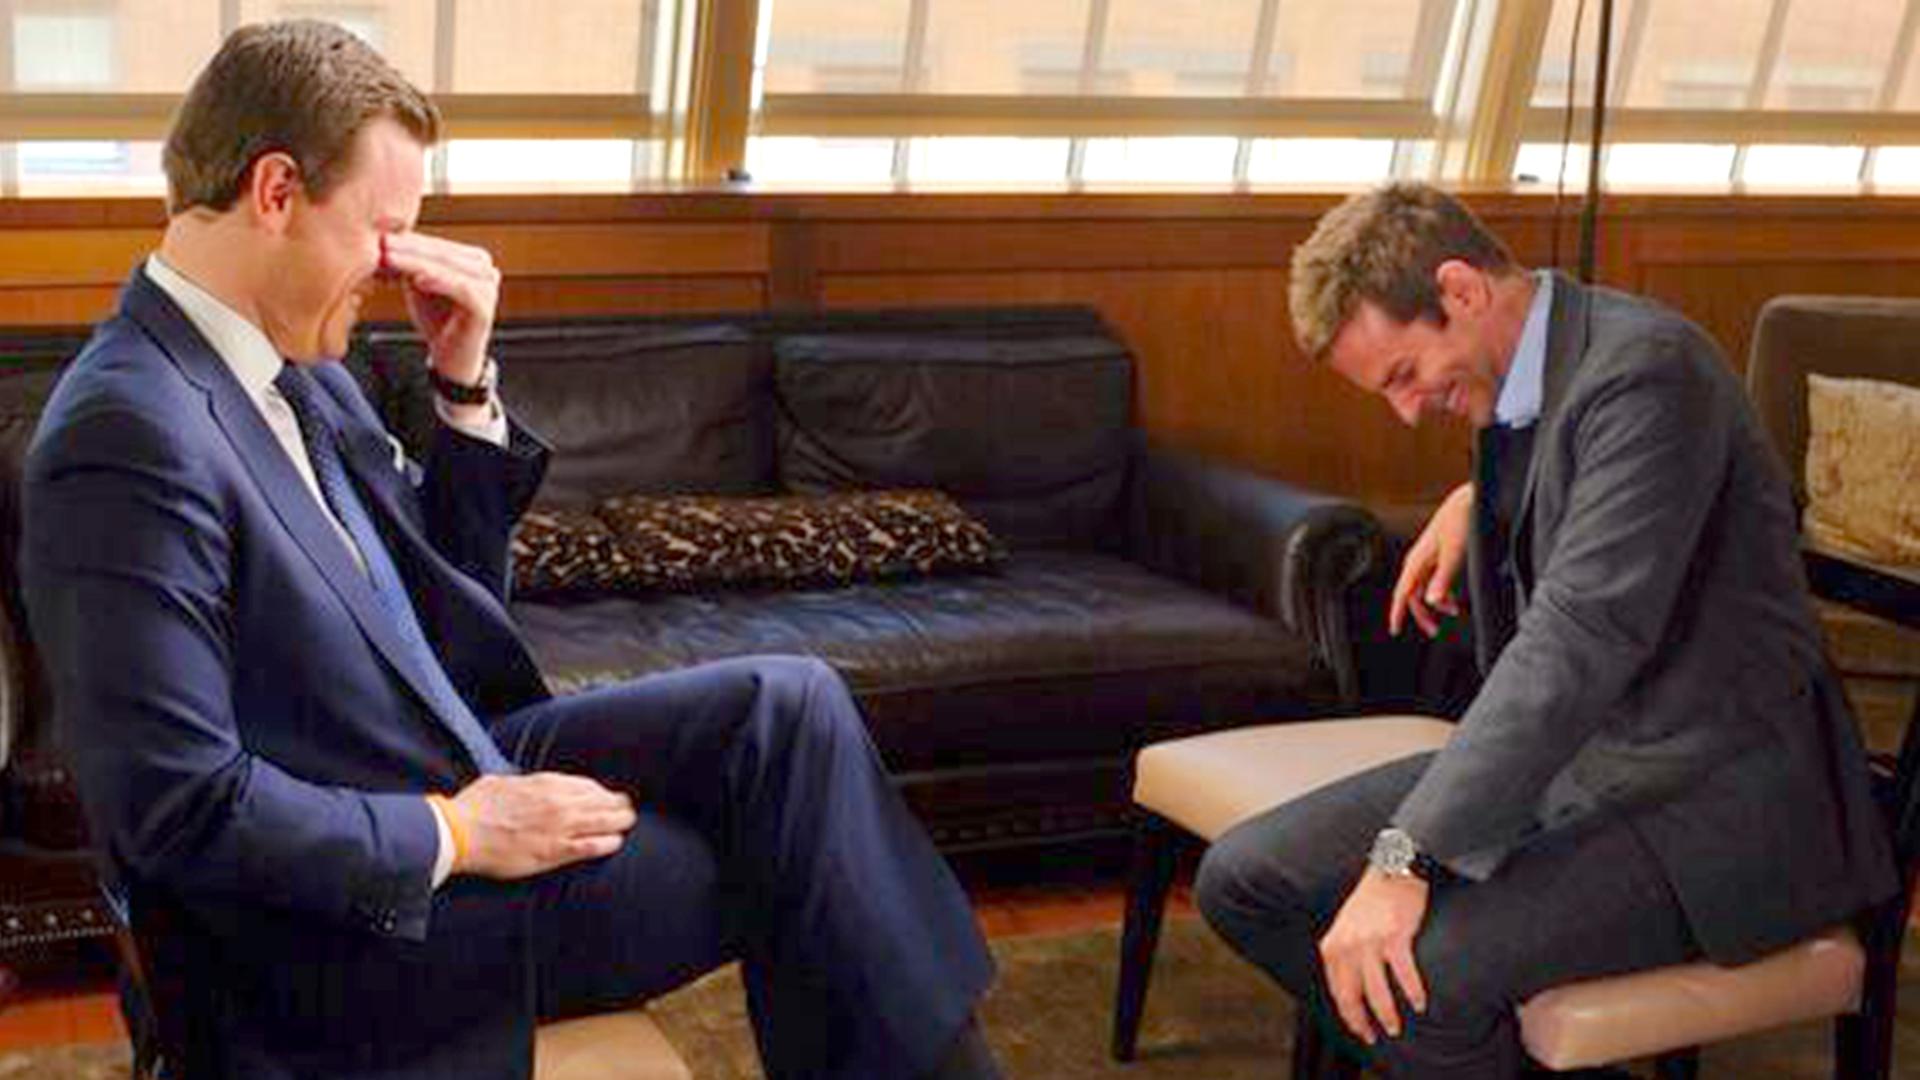 Image: Willie Geist and Bradley Cooper